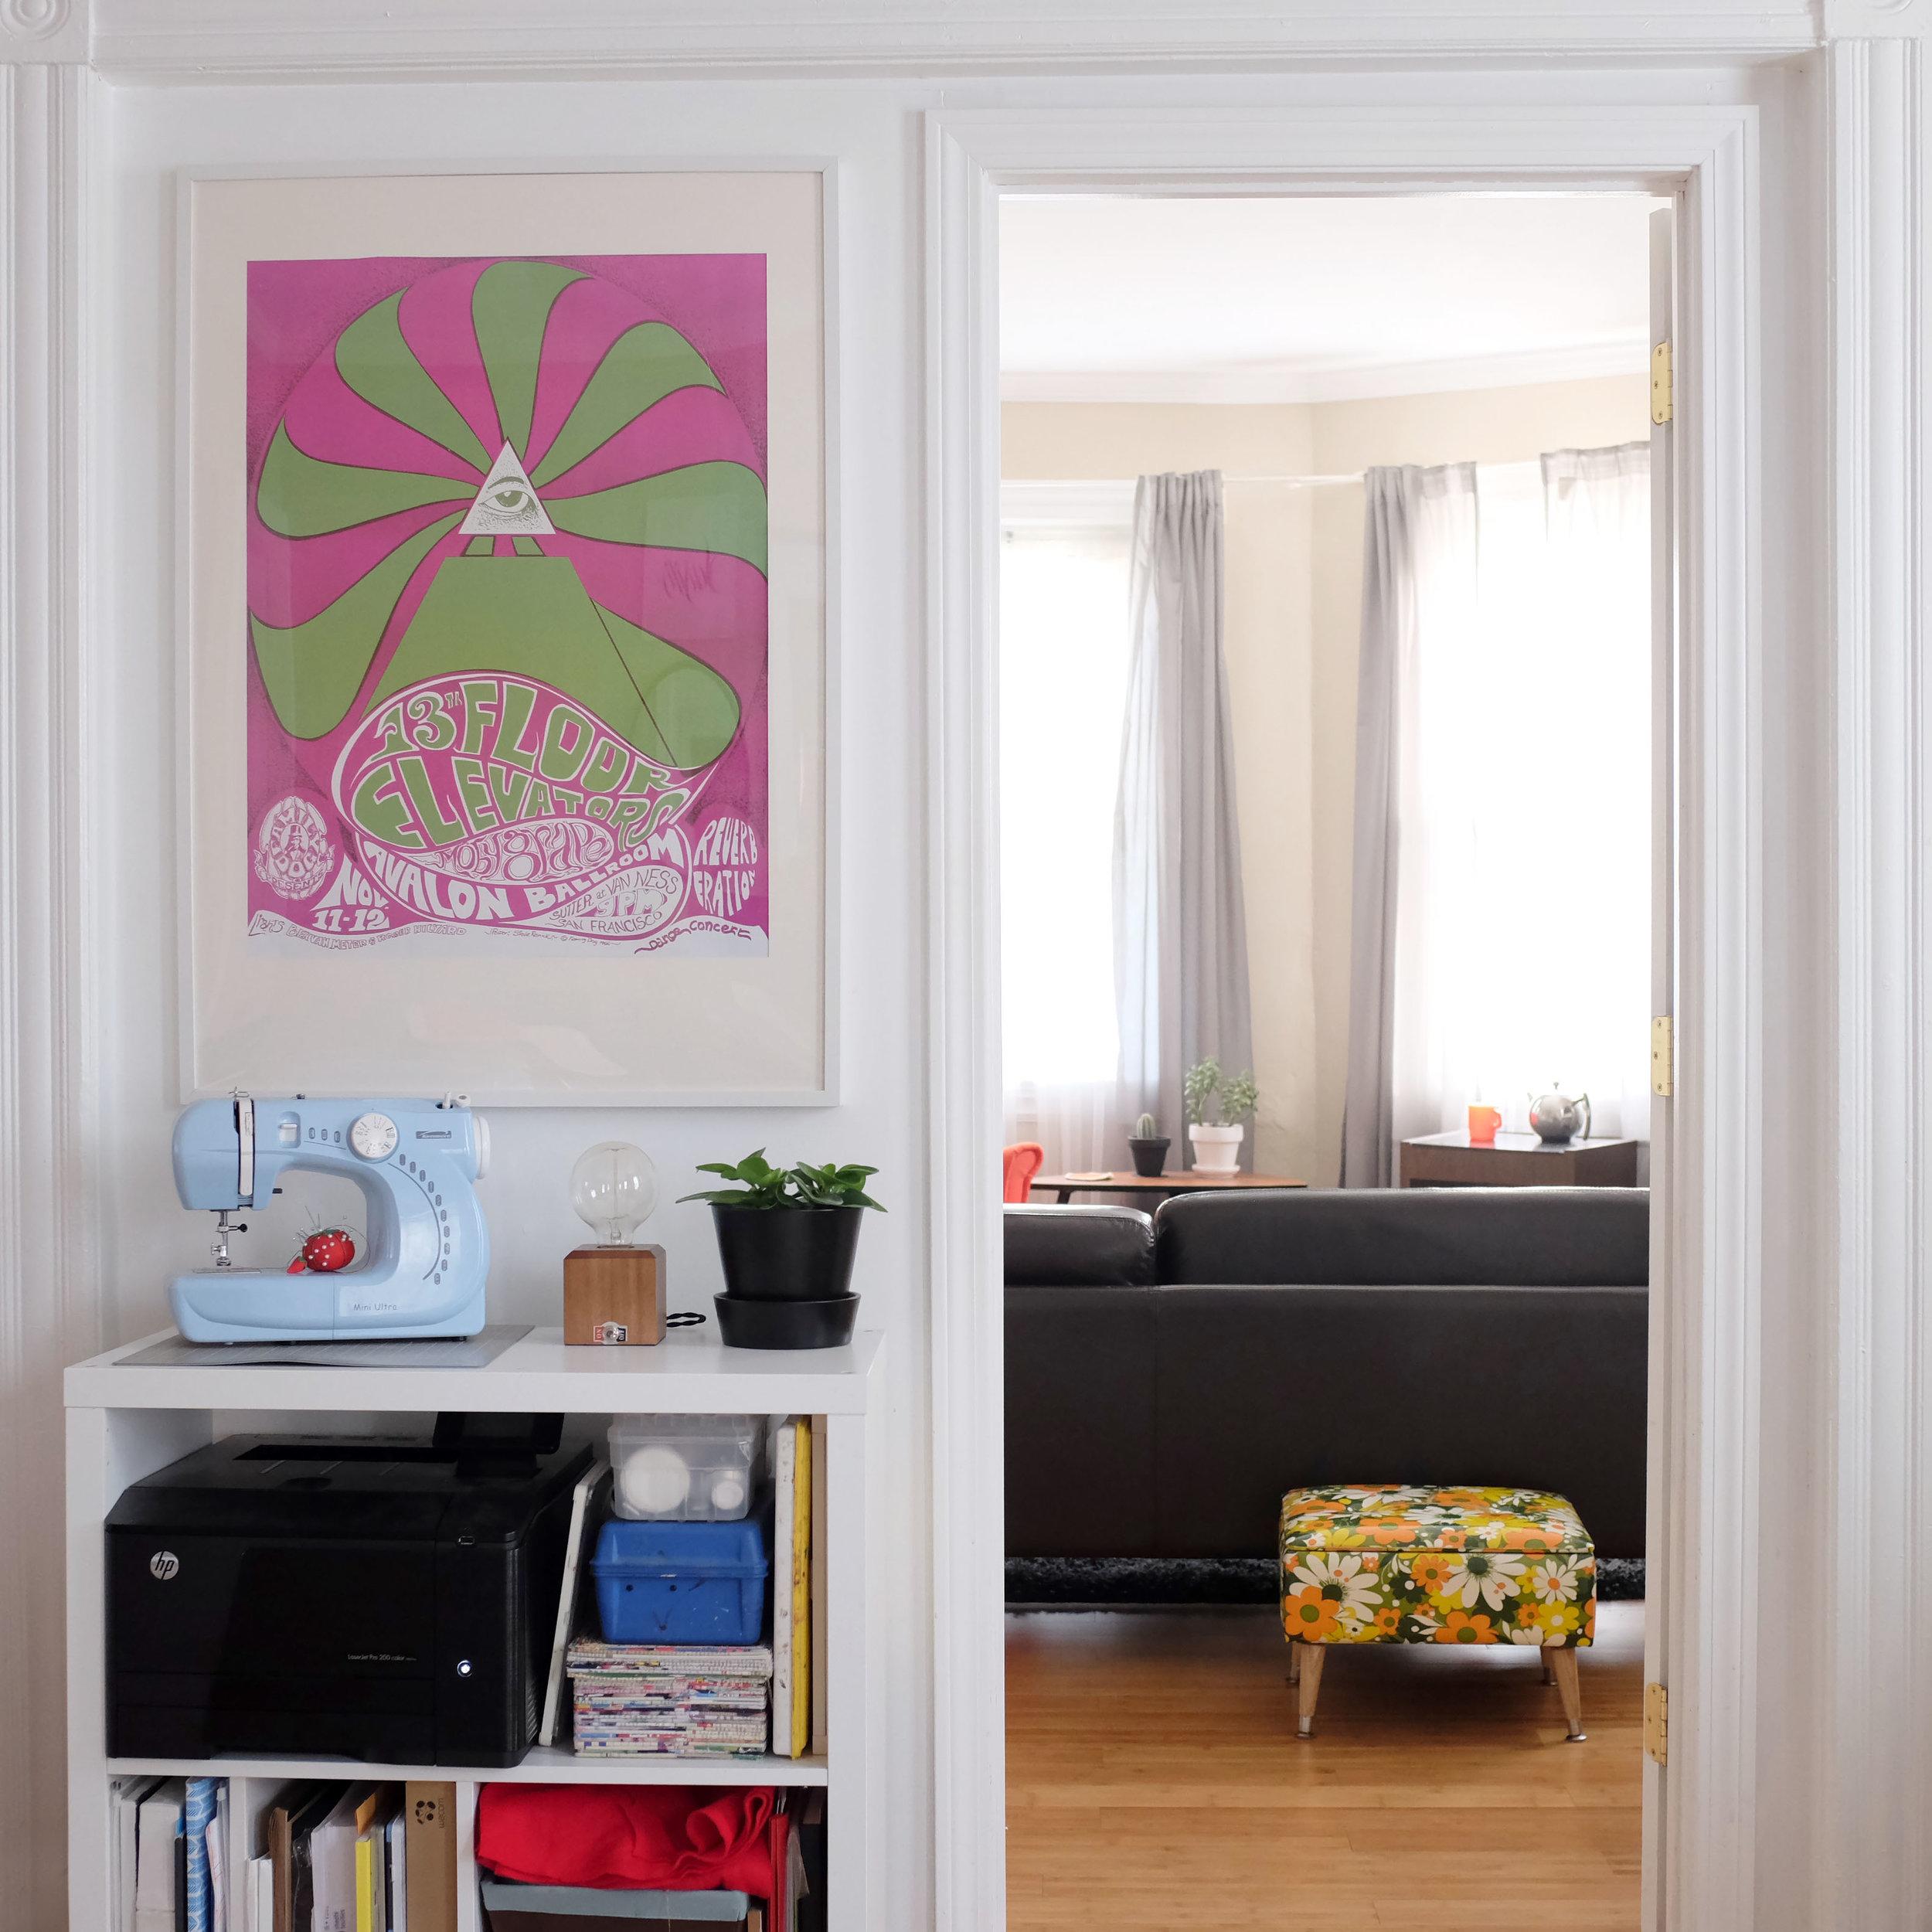 LinziClary_Apartment_05.JPG